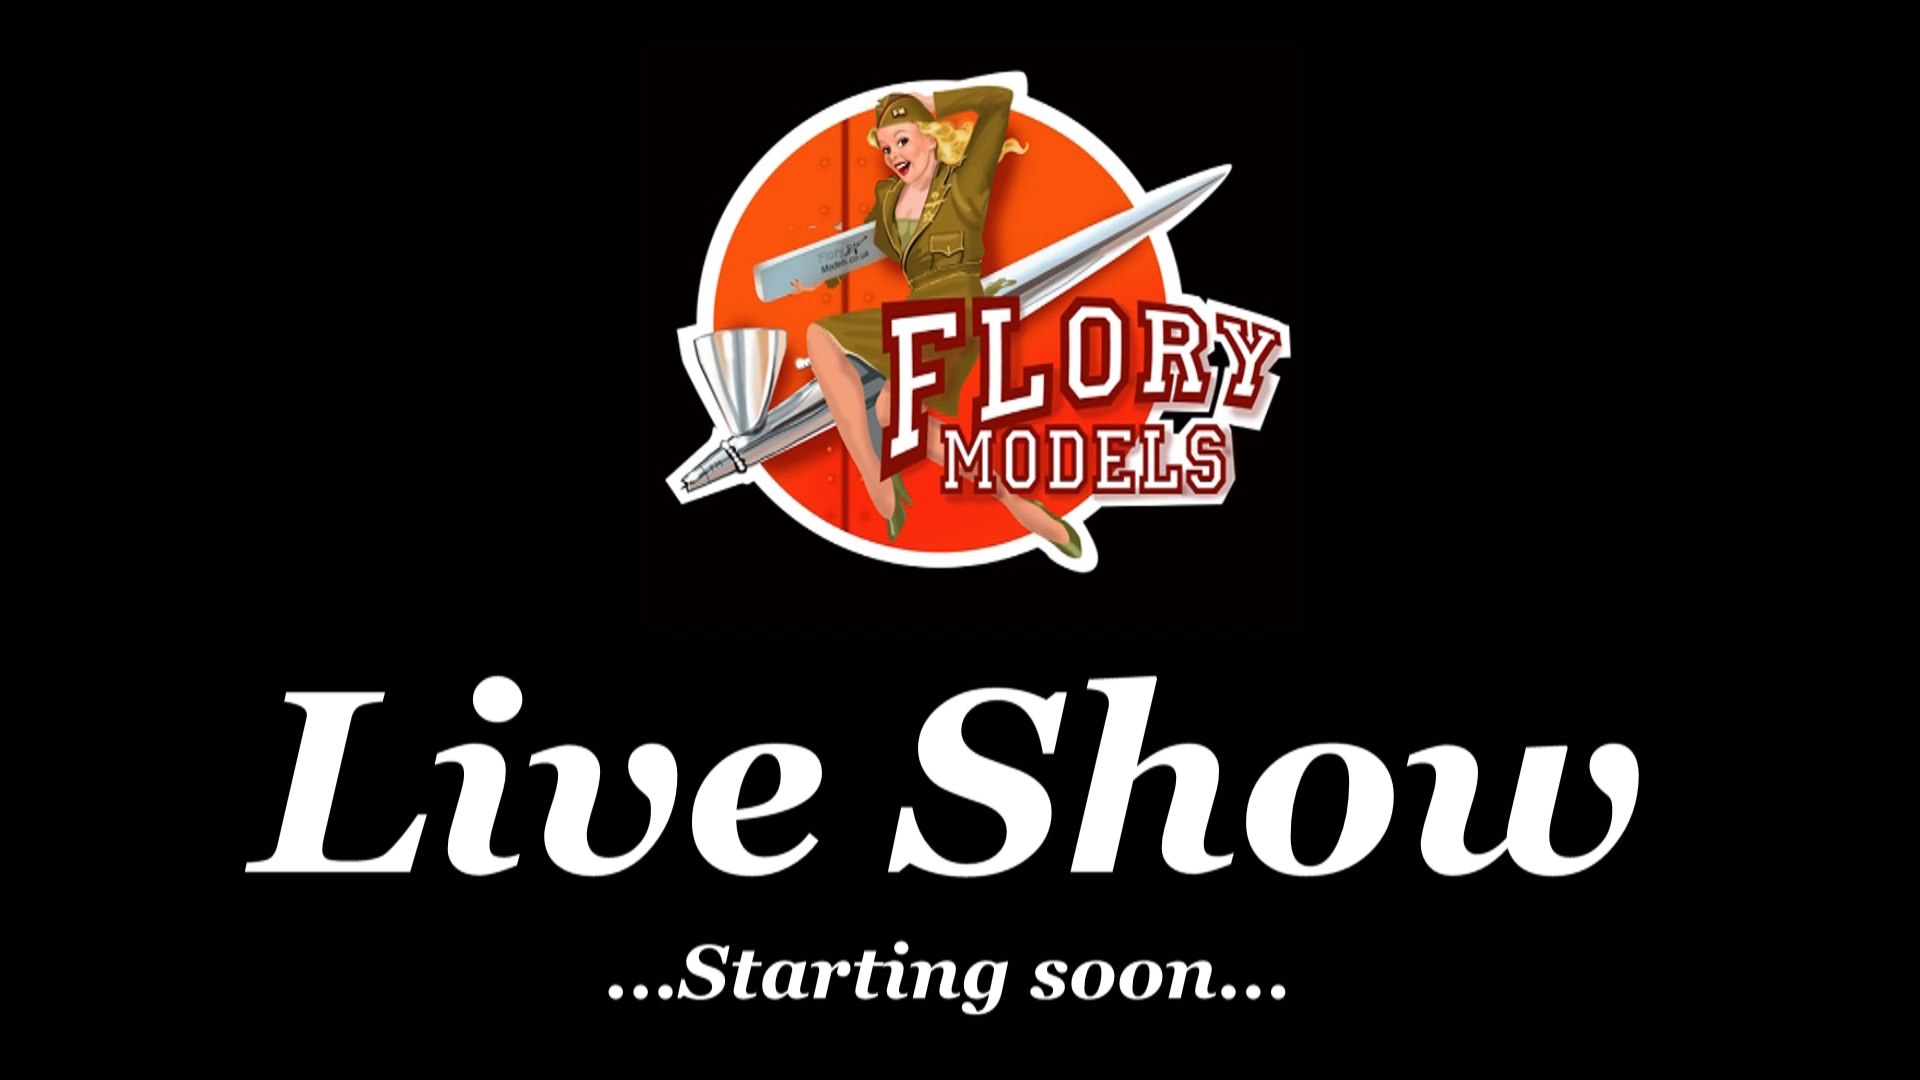 Live show starting soon.jpg